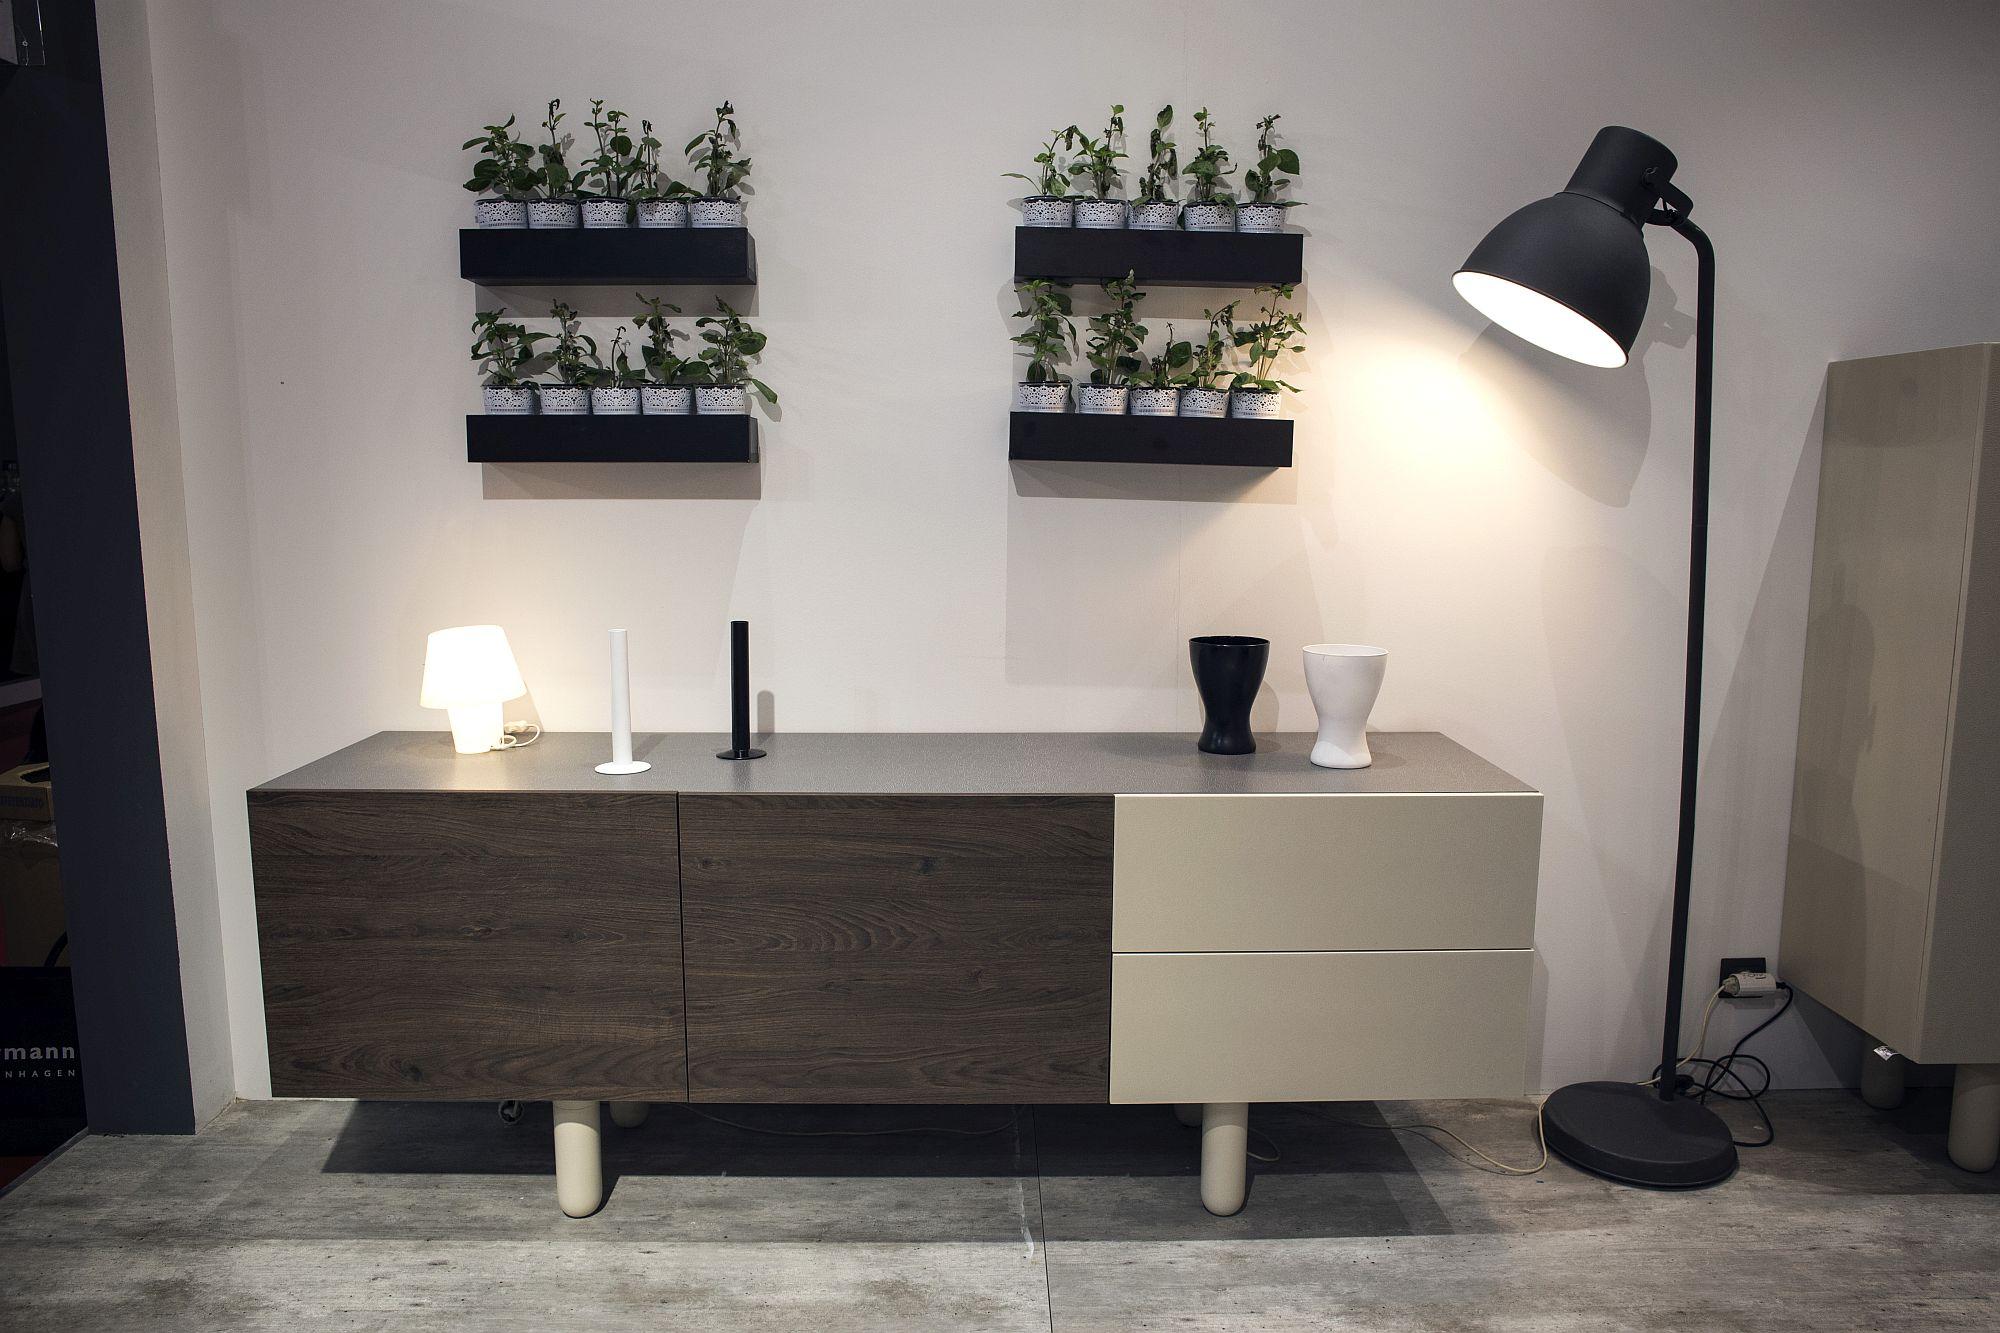 Dashing-floor-lamp-in-the-Scandinavian-style-living-room-setting